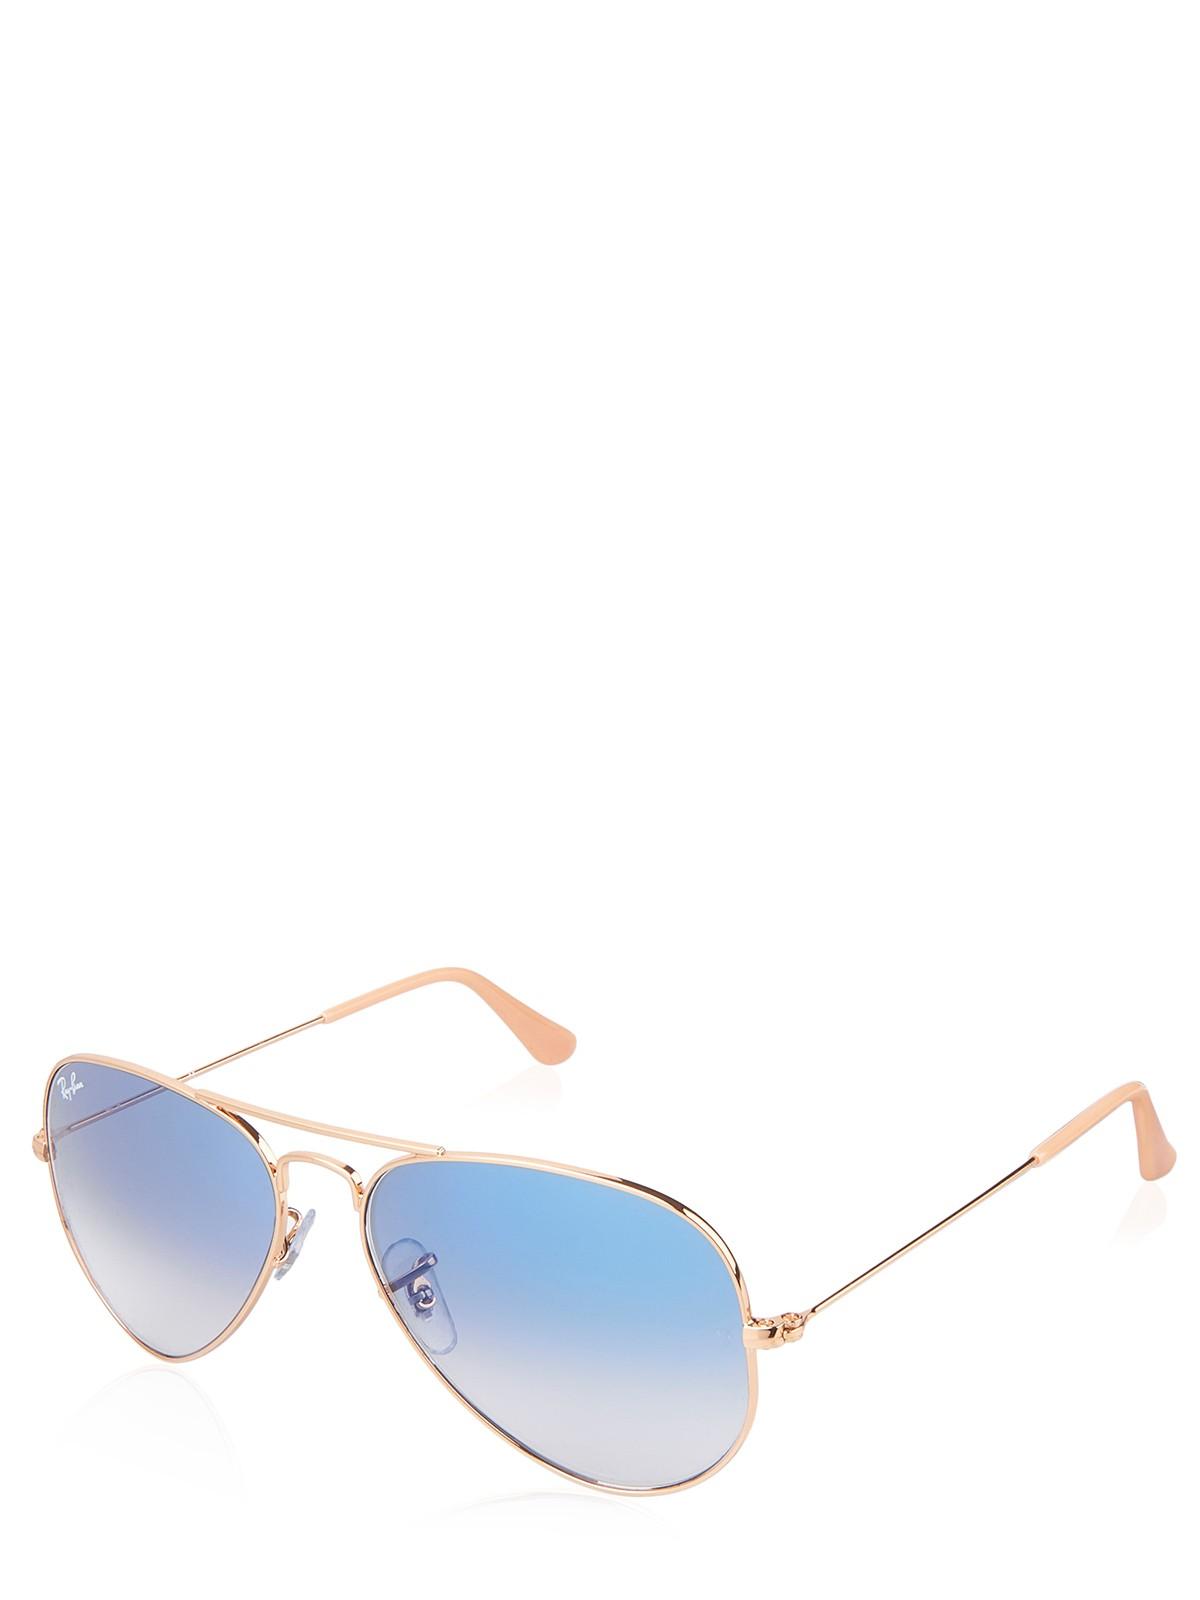 lunette ray ban prix maroc